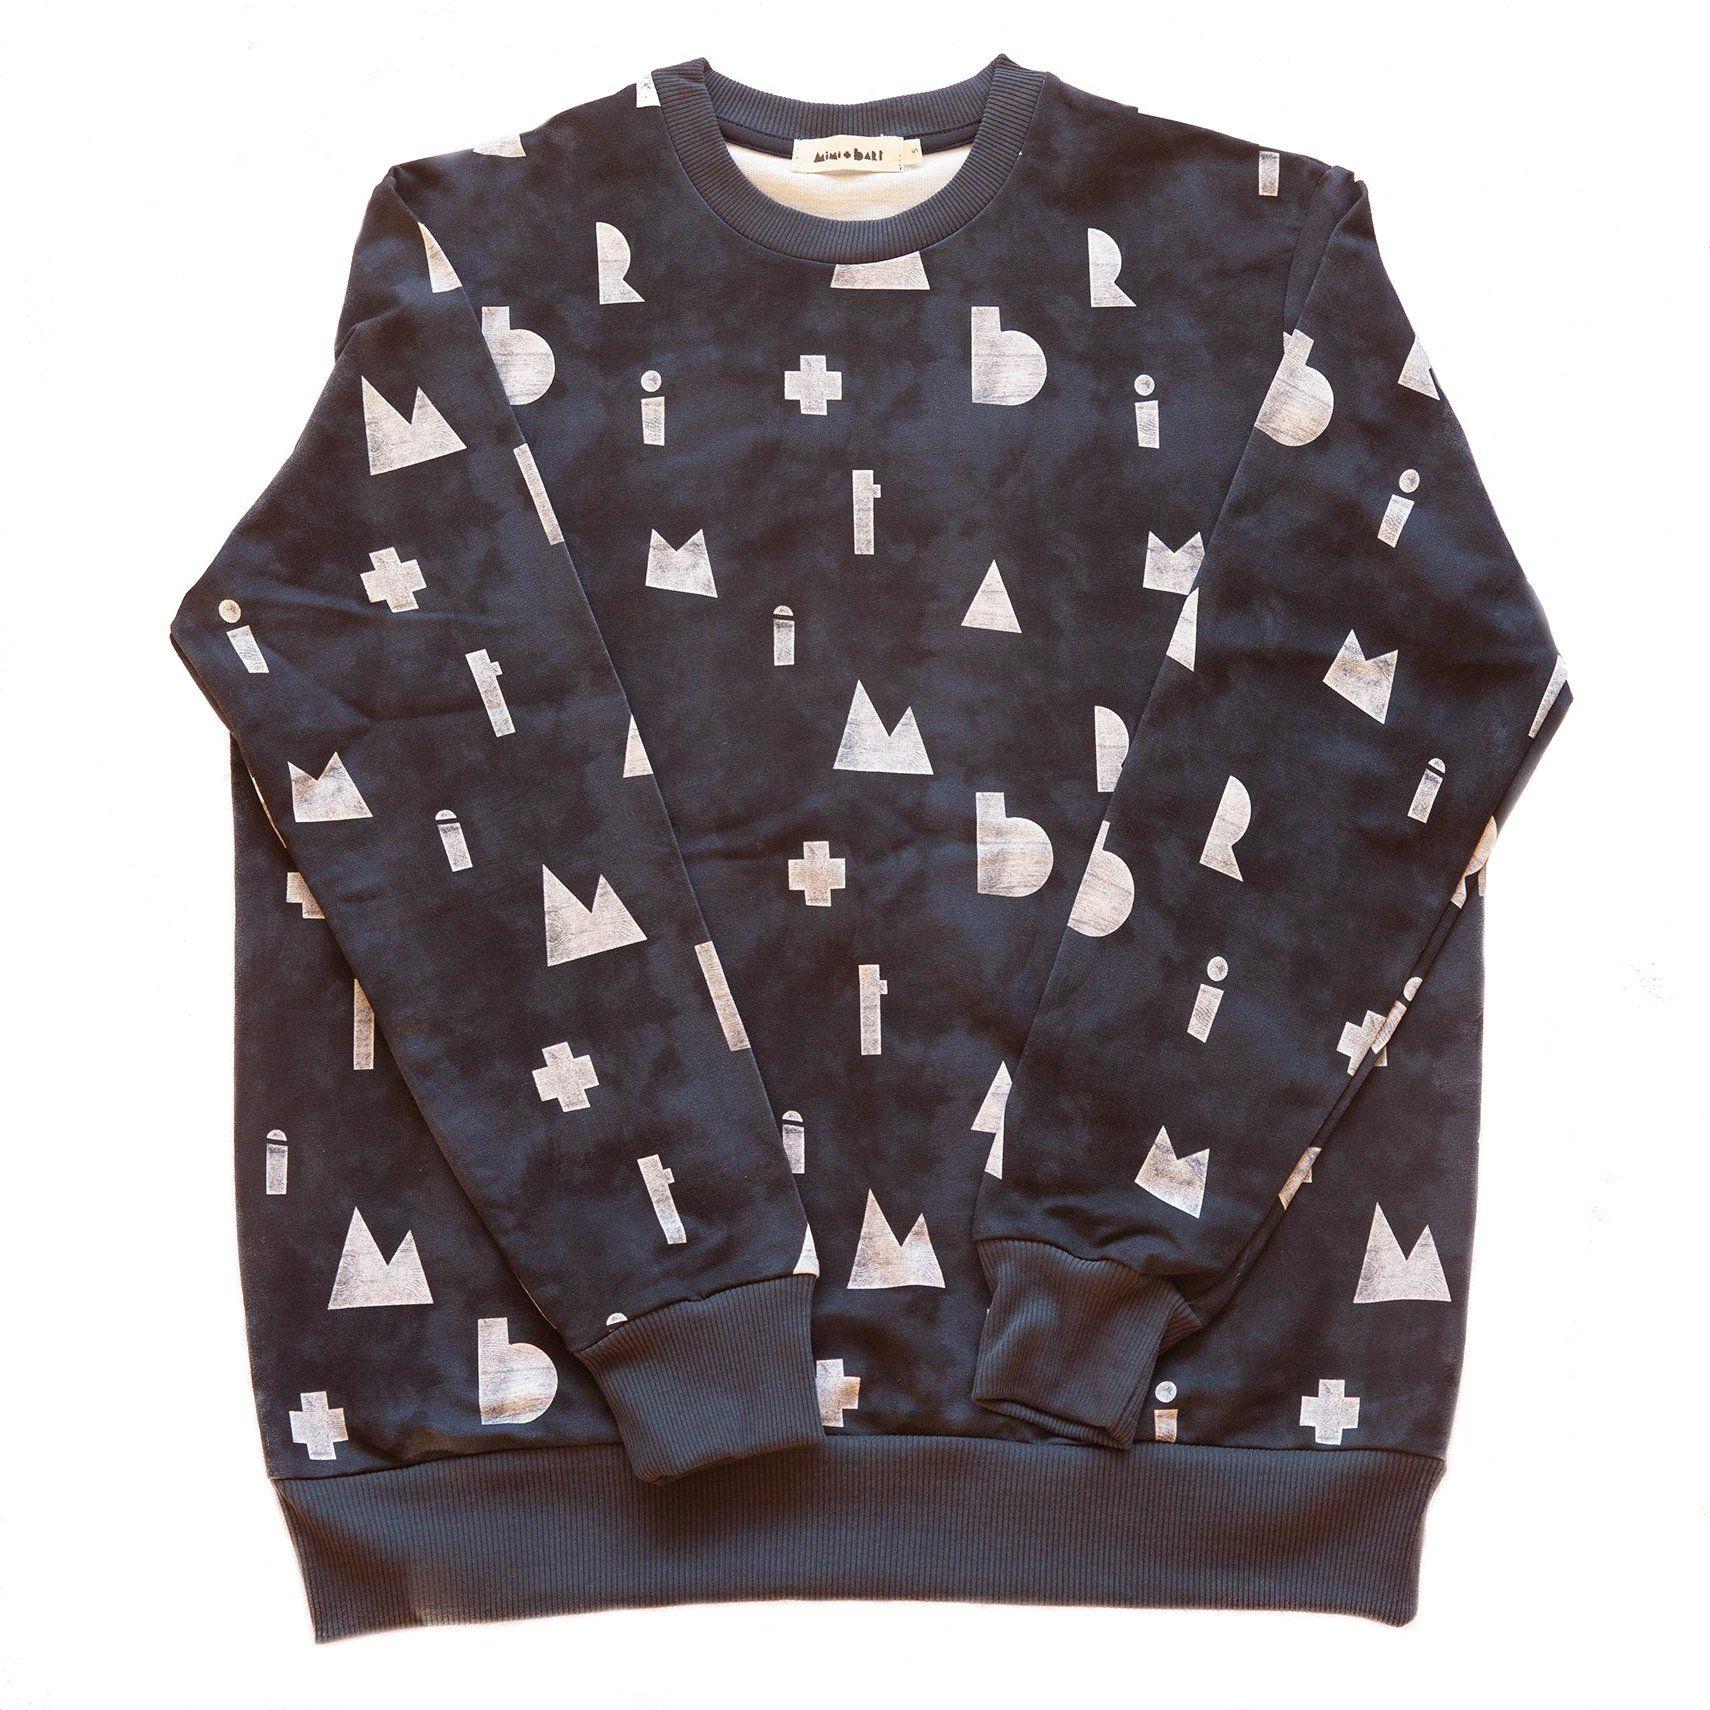 adult dark blue sweater with white logo print, organic cotton